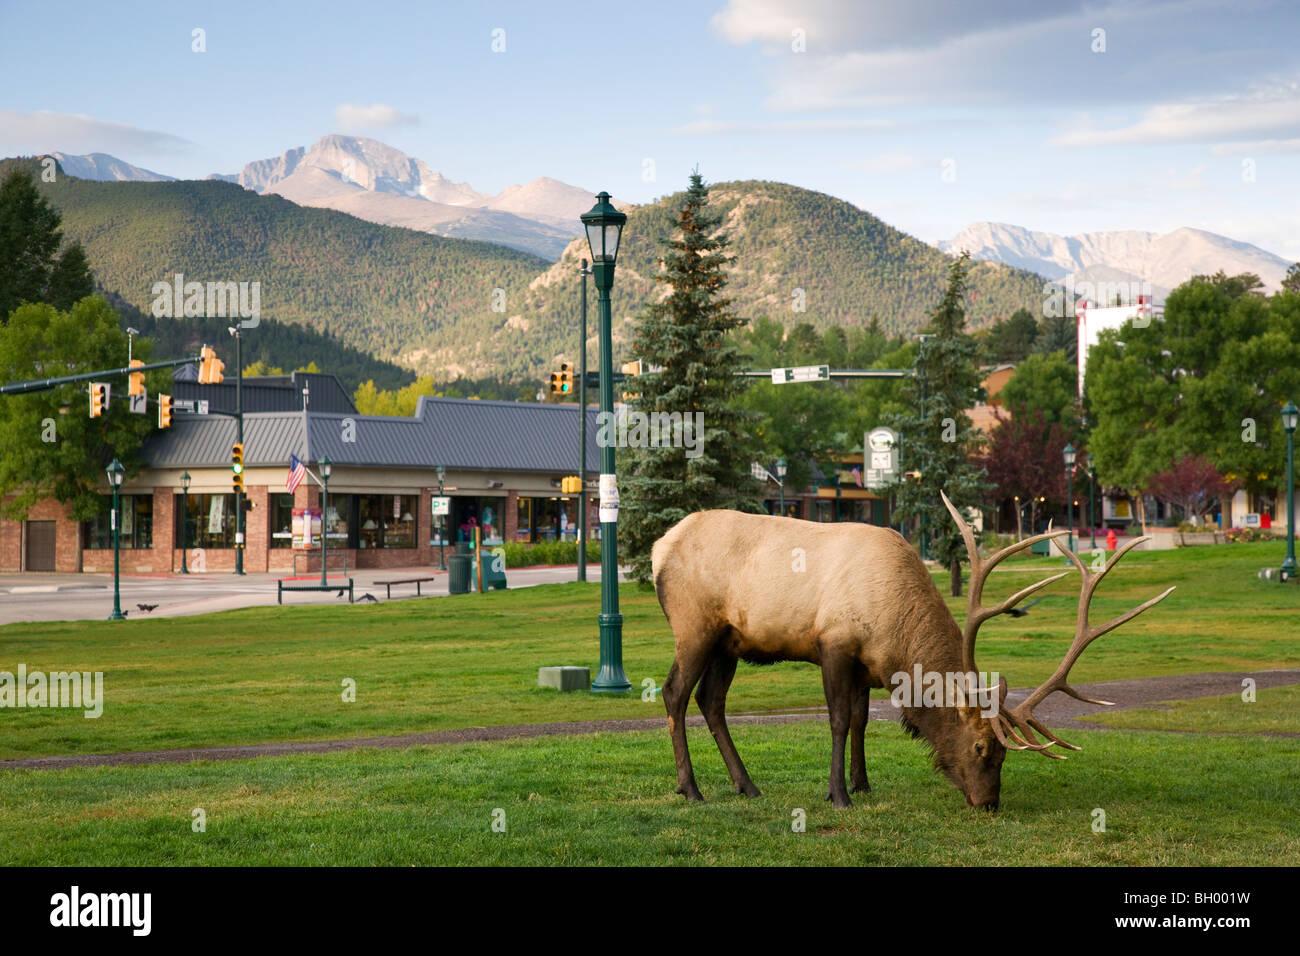 Elk in Estes Park, gateway to Rocky Mountain National Park, Colorado. - Stock Image